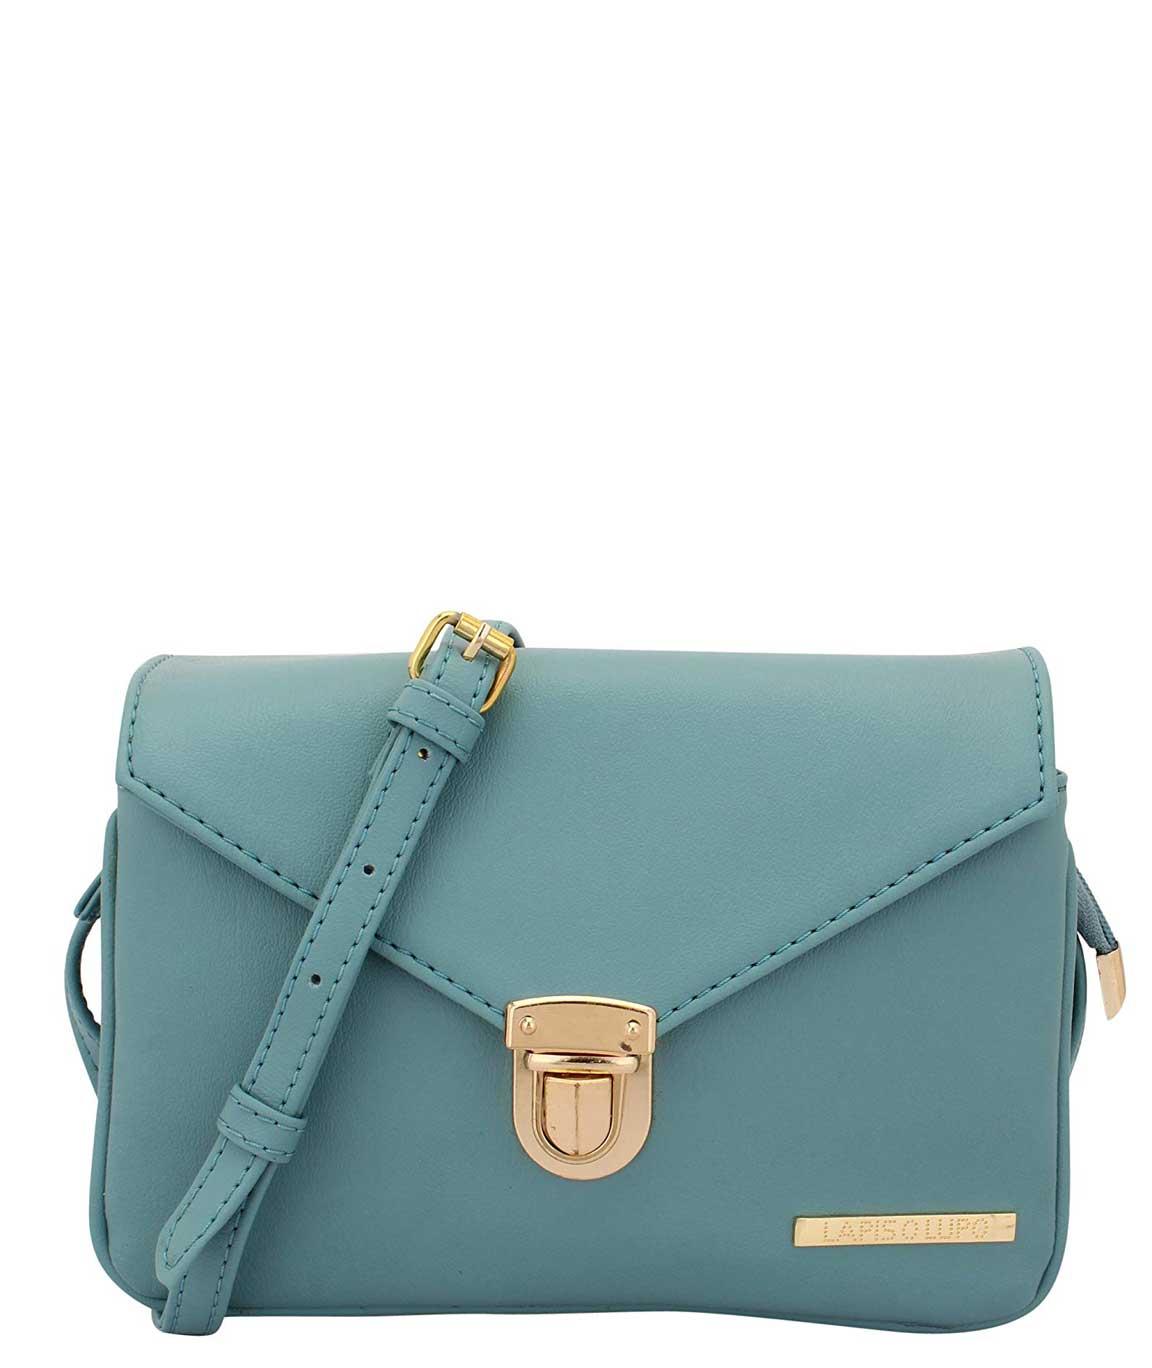 Lapis O Lupo Glaucous Women`s Polyurethane Sling Bag (Light Turquoise)